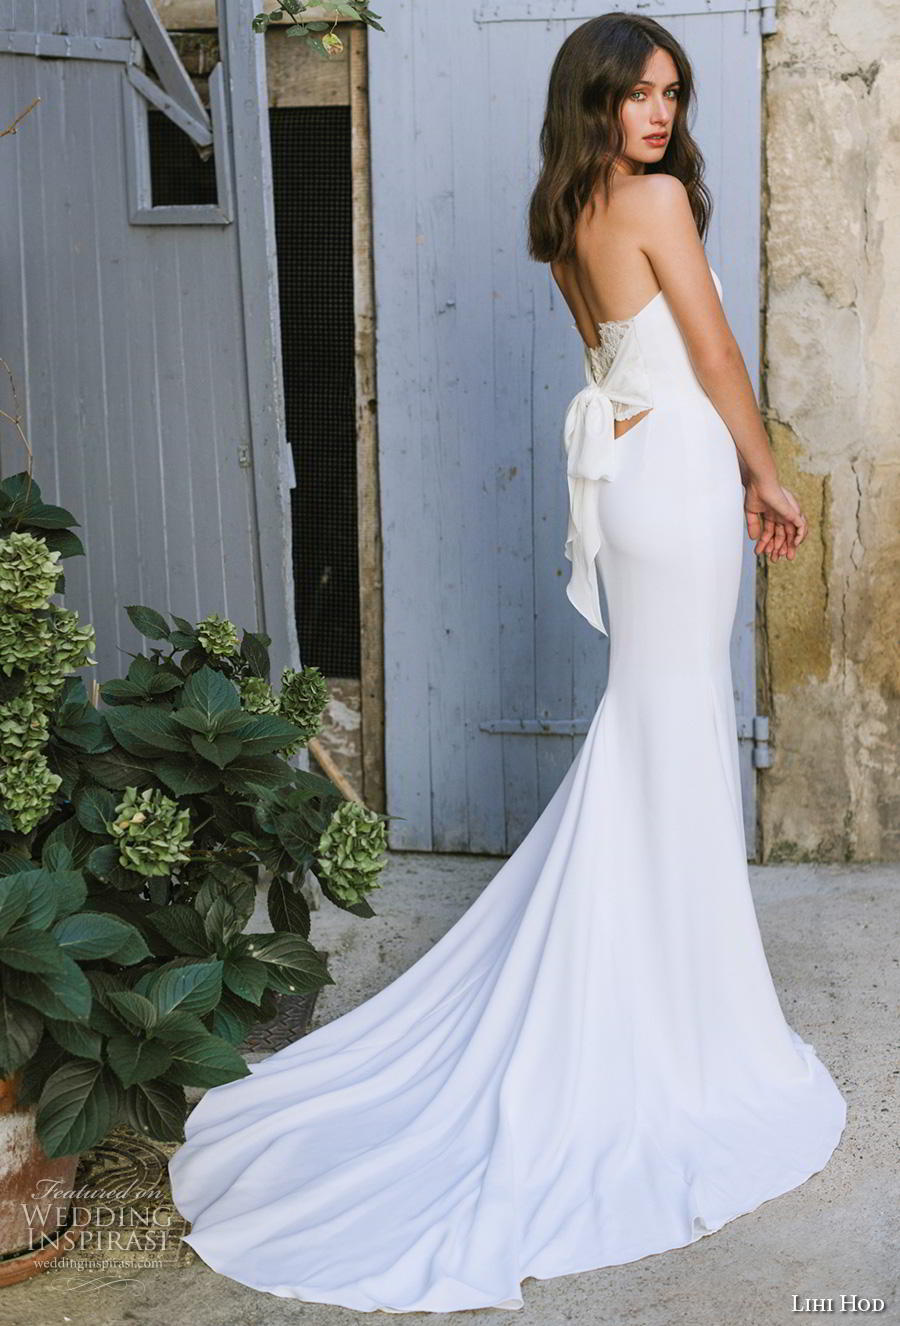 lihi hod 2019 bridal strapless sweetheart neckline simple minimalist elegant classic fit and flare wedding dress backless ribbon back chapel train (3) bv